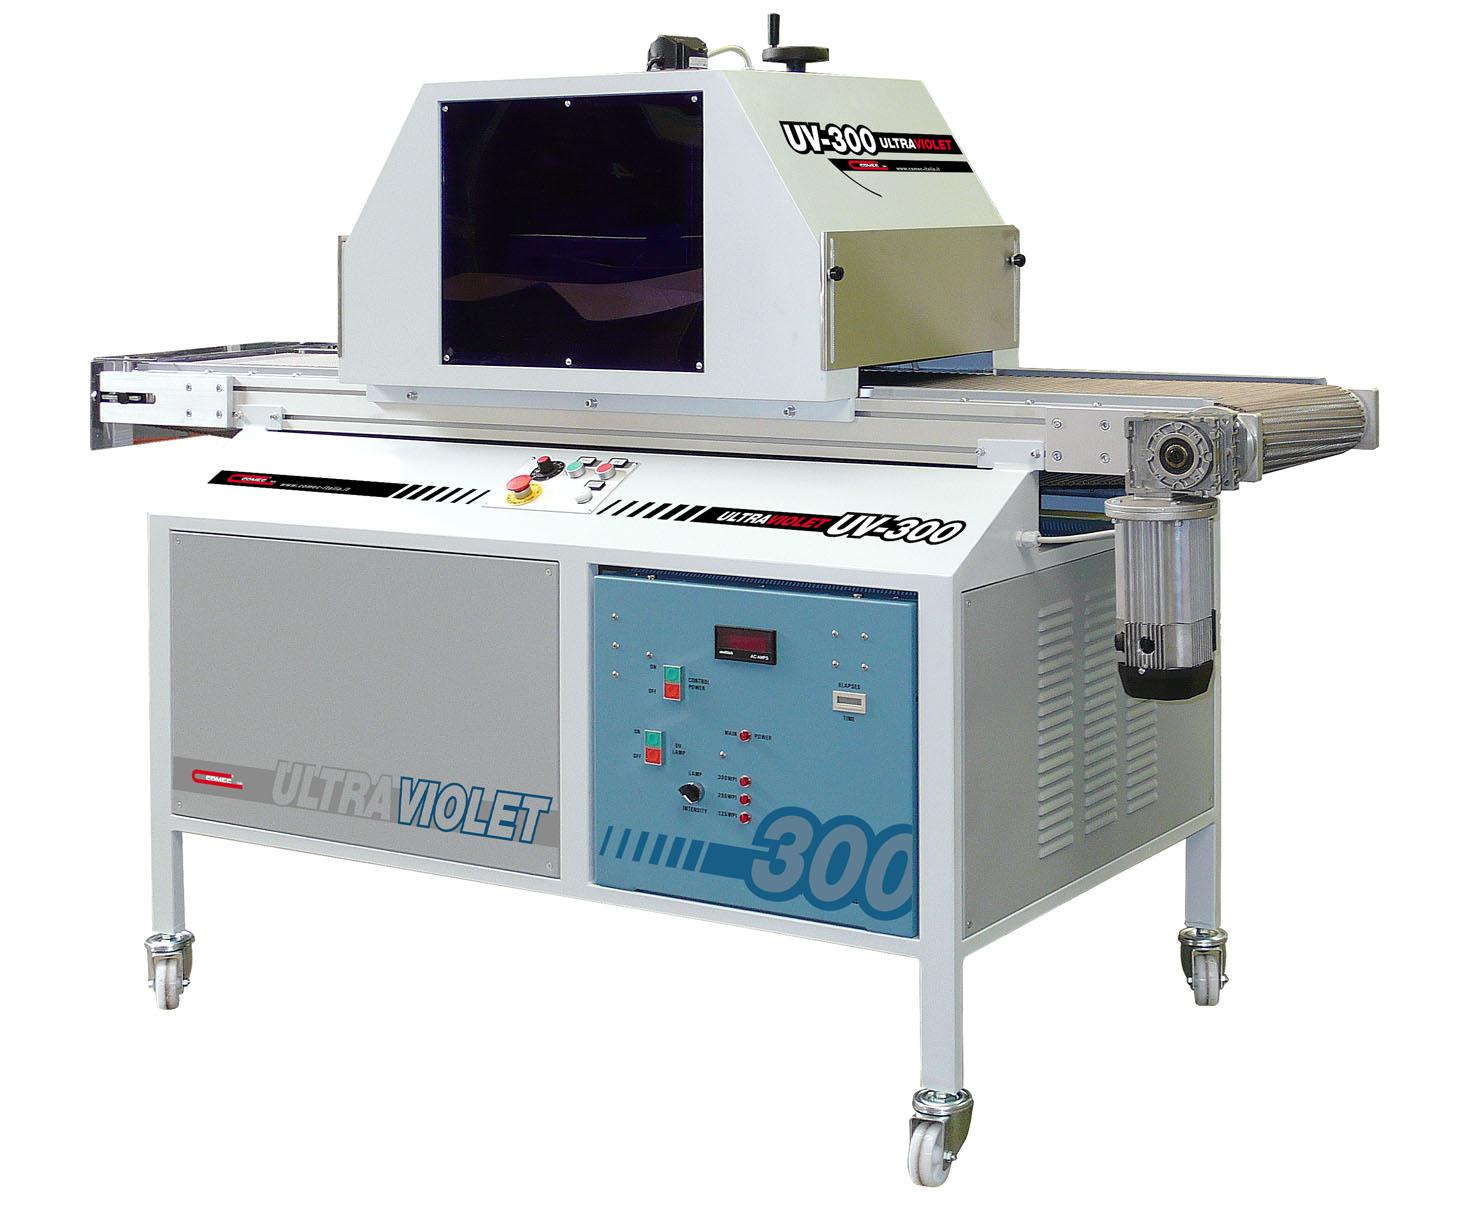 UV300